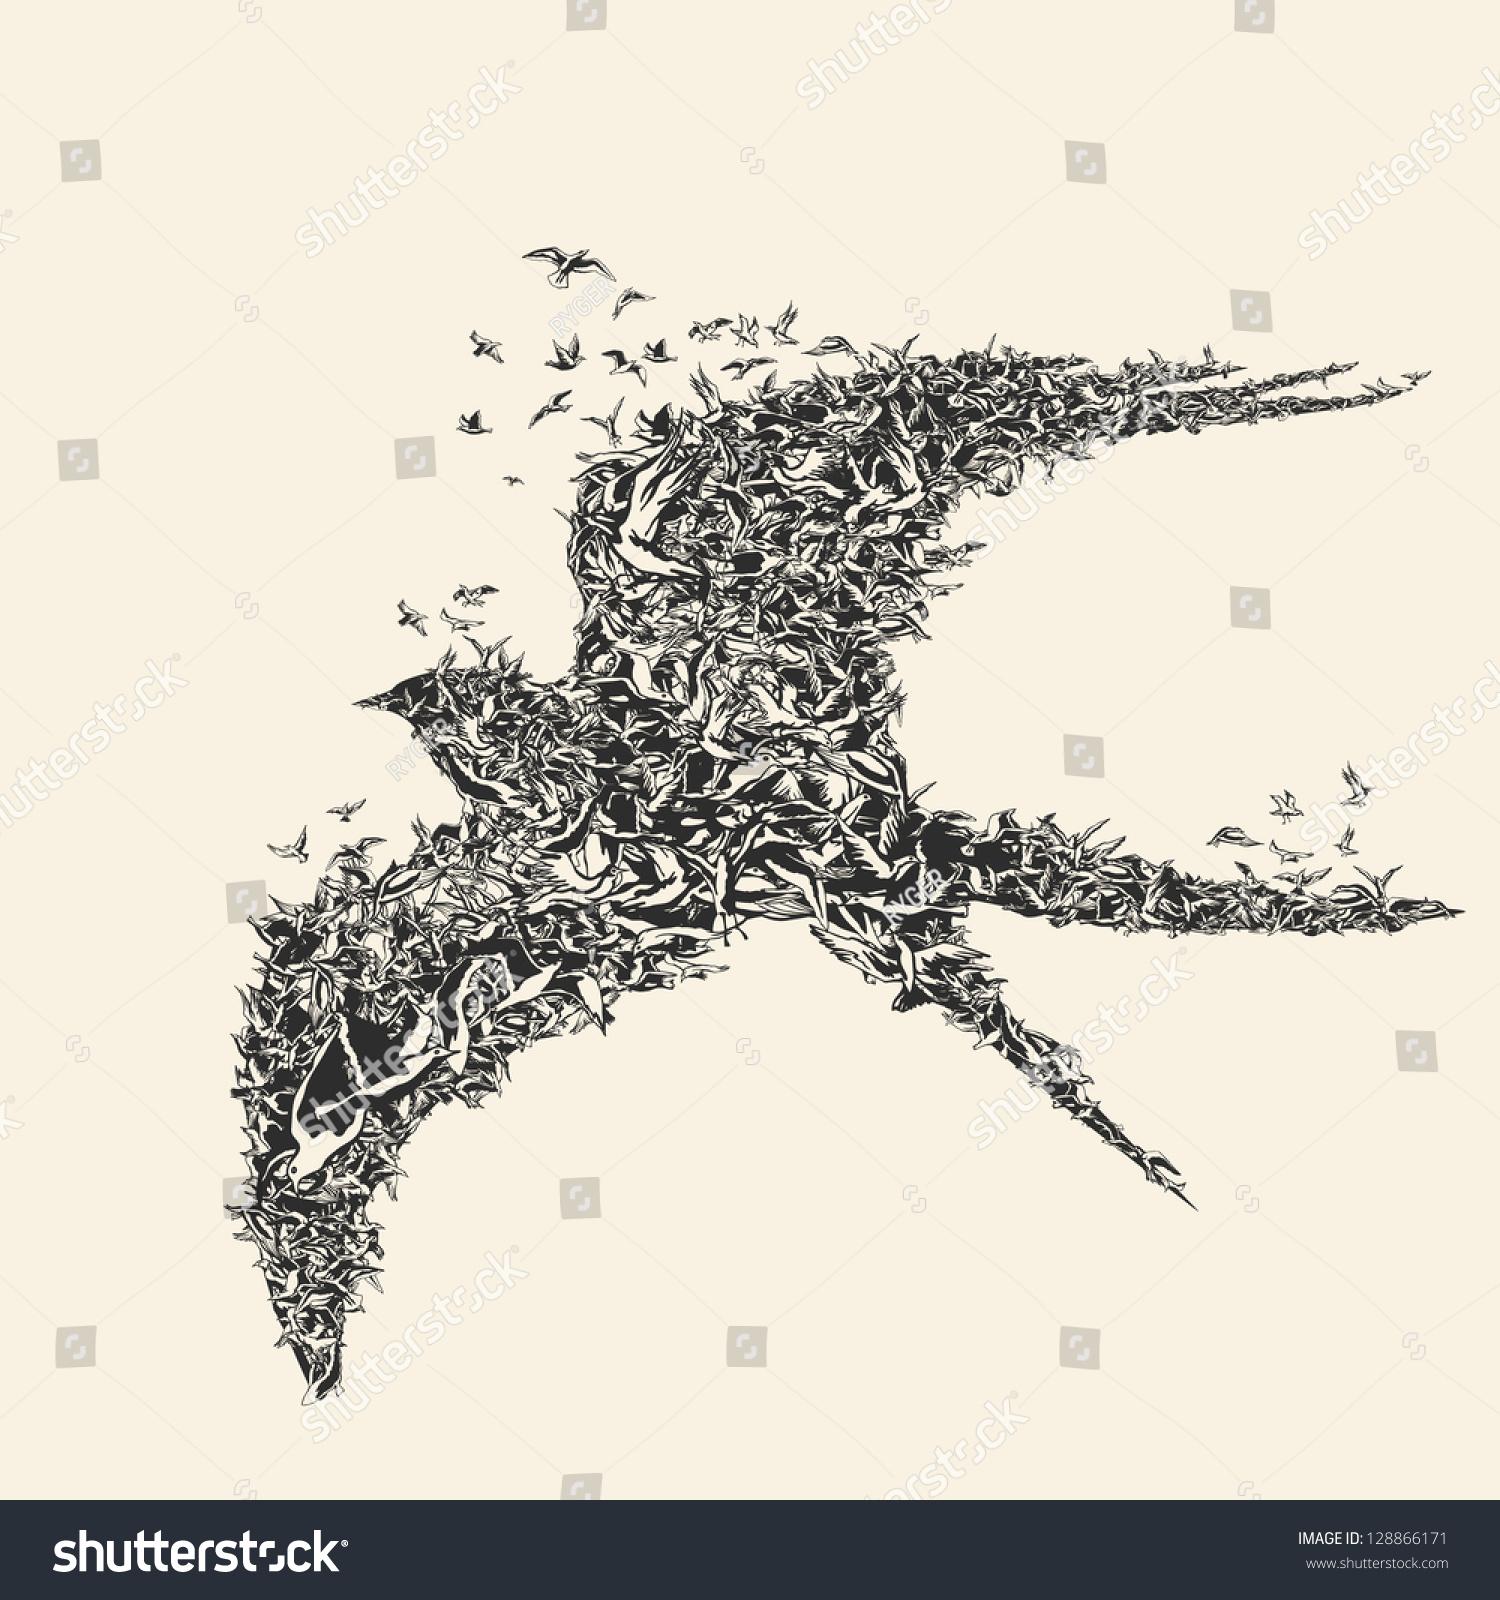 Stock Vector Flock Of Birds In Bird Formation